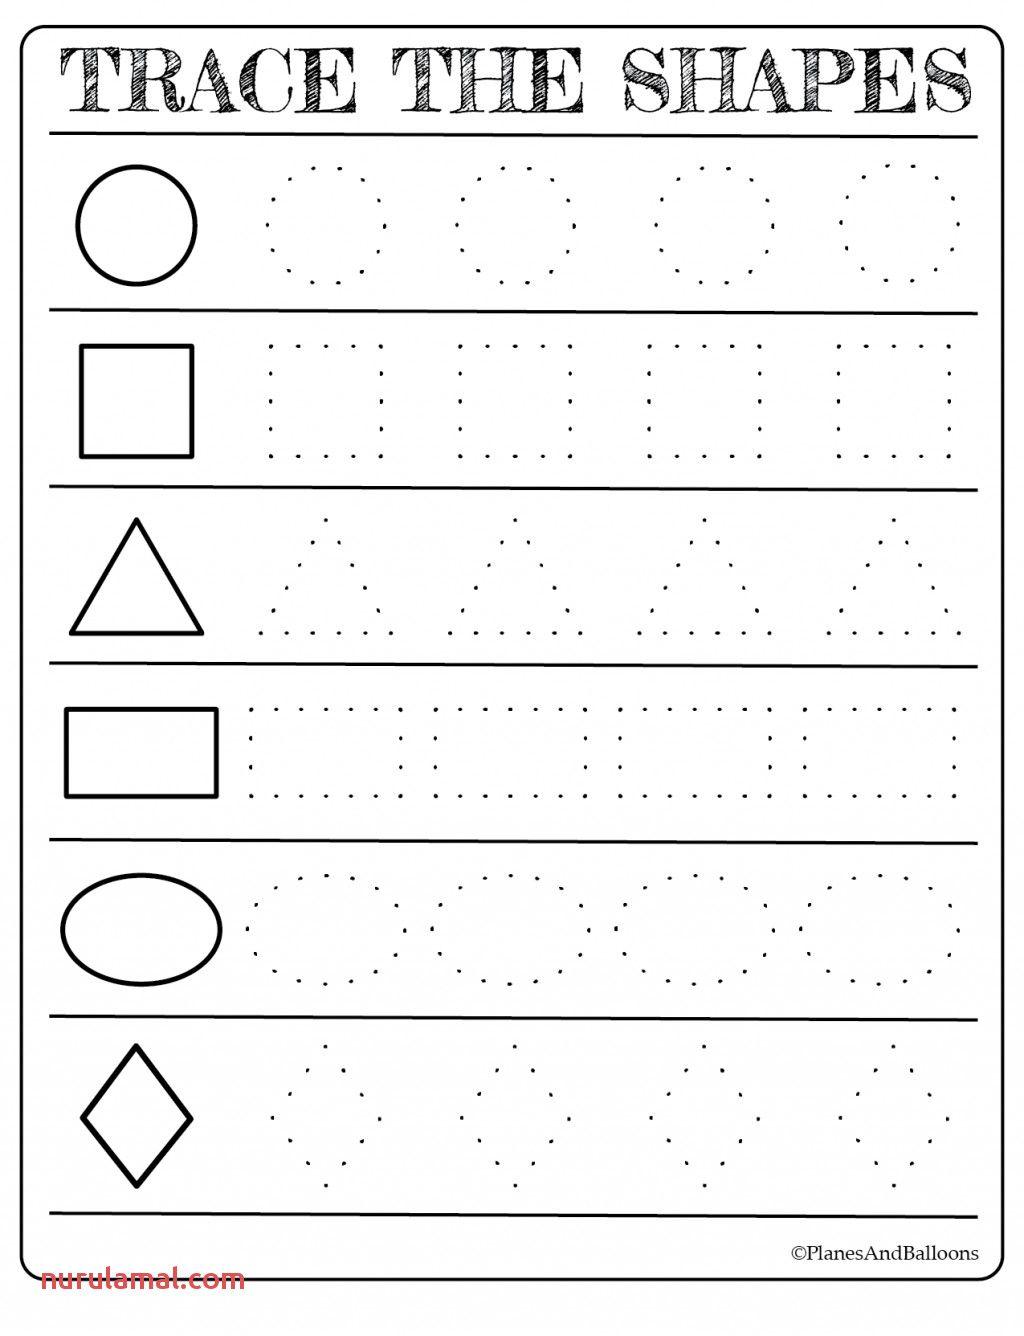 Rectangle Worksheet For Kids Free Preschool Worksheets Preschool Forms Shape Activities Preschool [ 1336 x 1024 Pixel ]